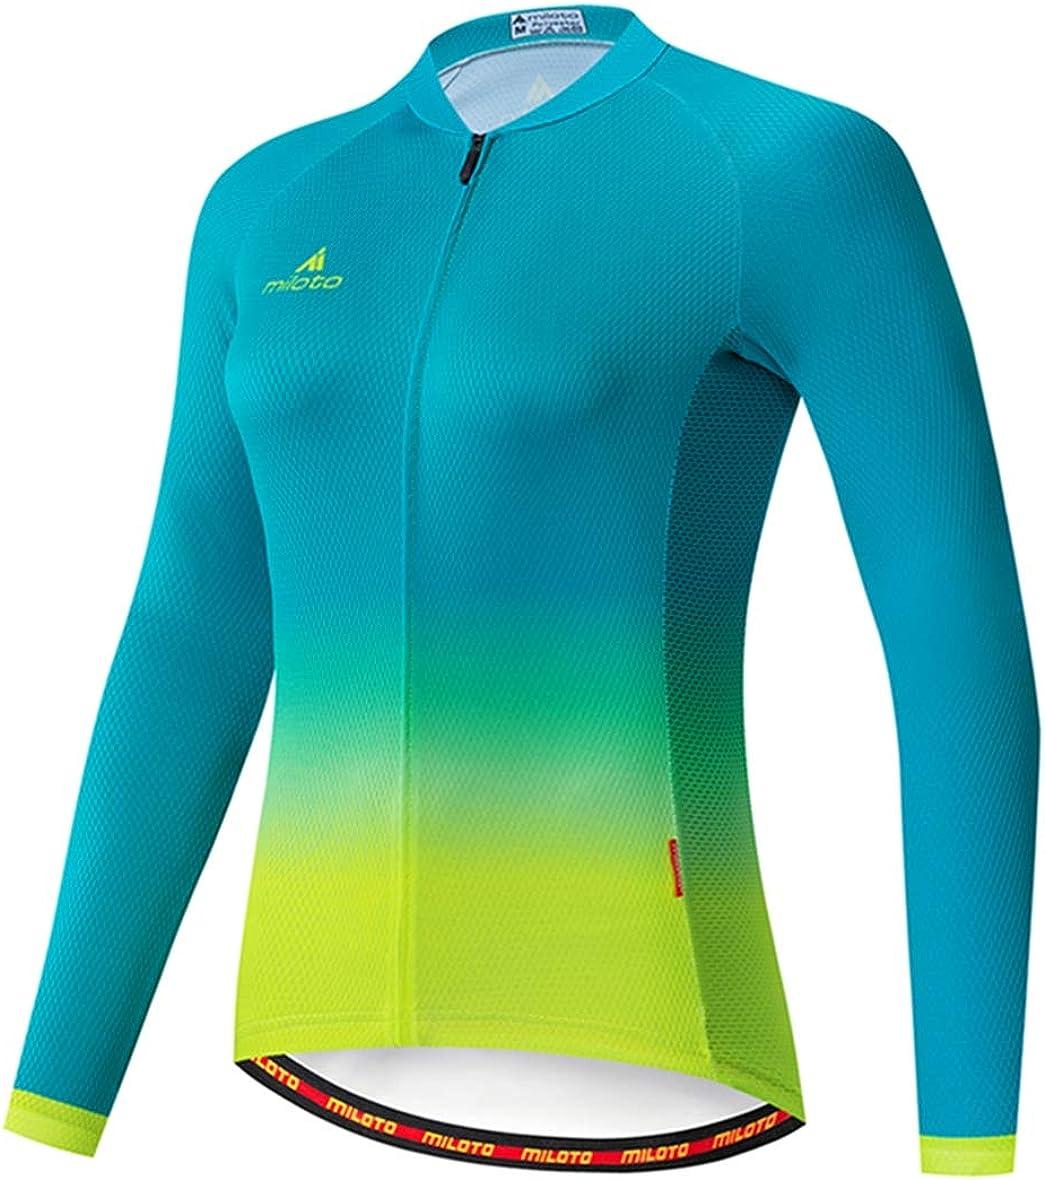 Max 53% OFF Women's Cycling Jersey Long Sleeve Quic Biking Jacket Shirt Bike Houston Mall